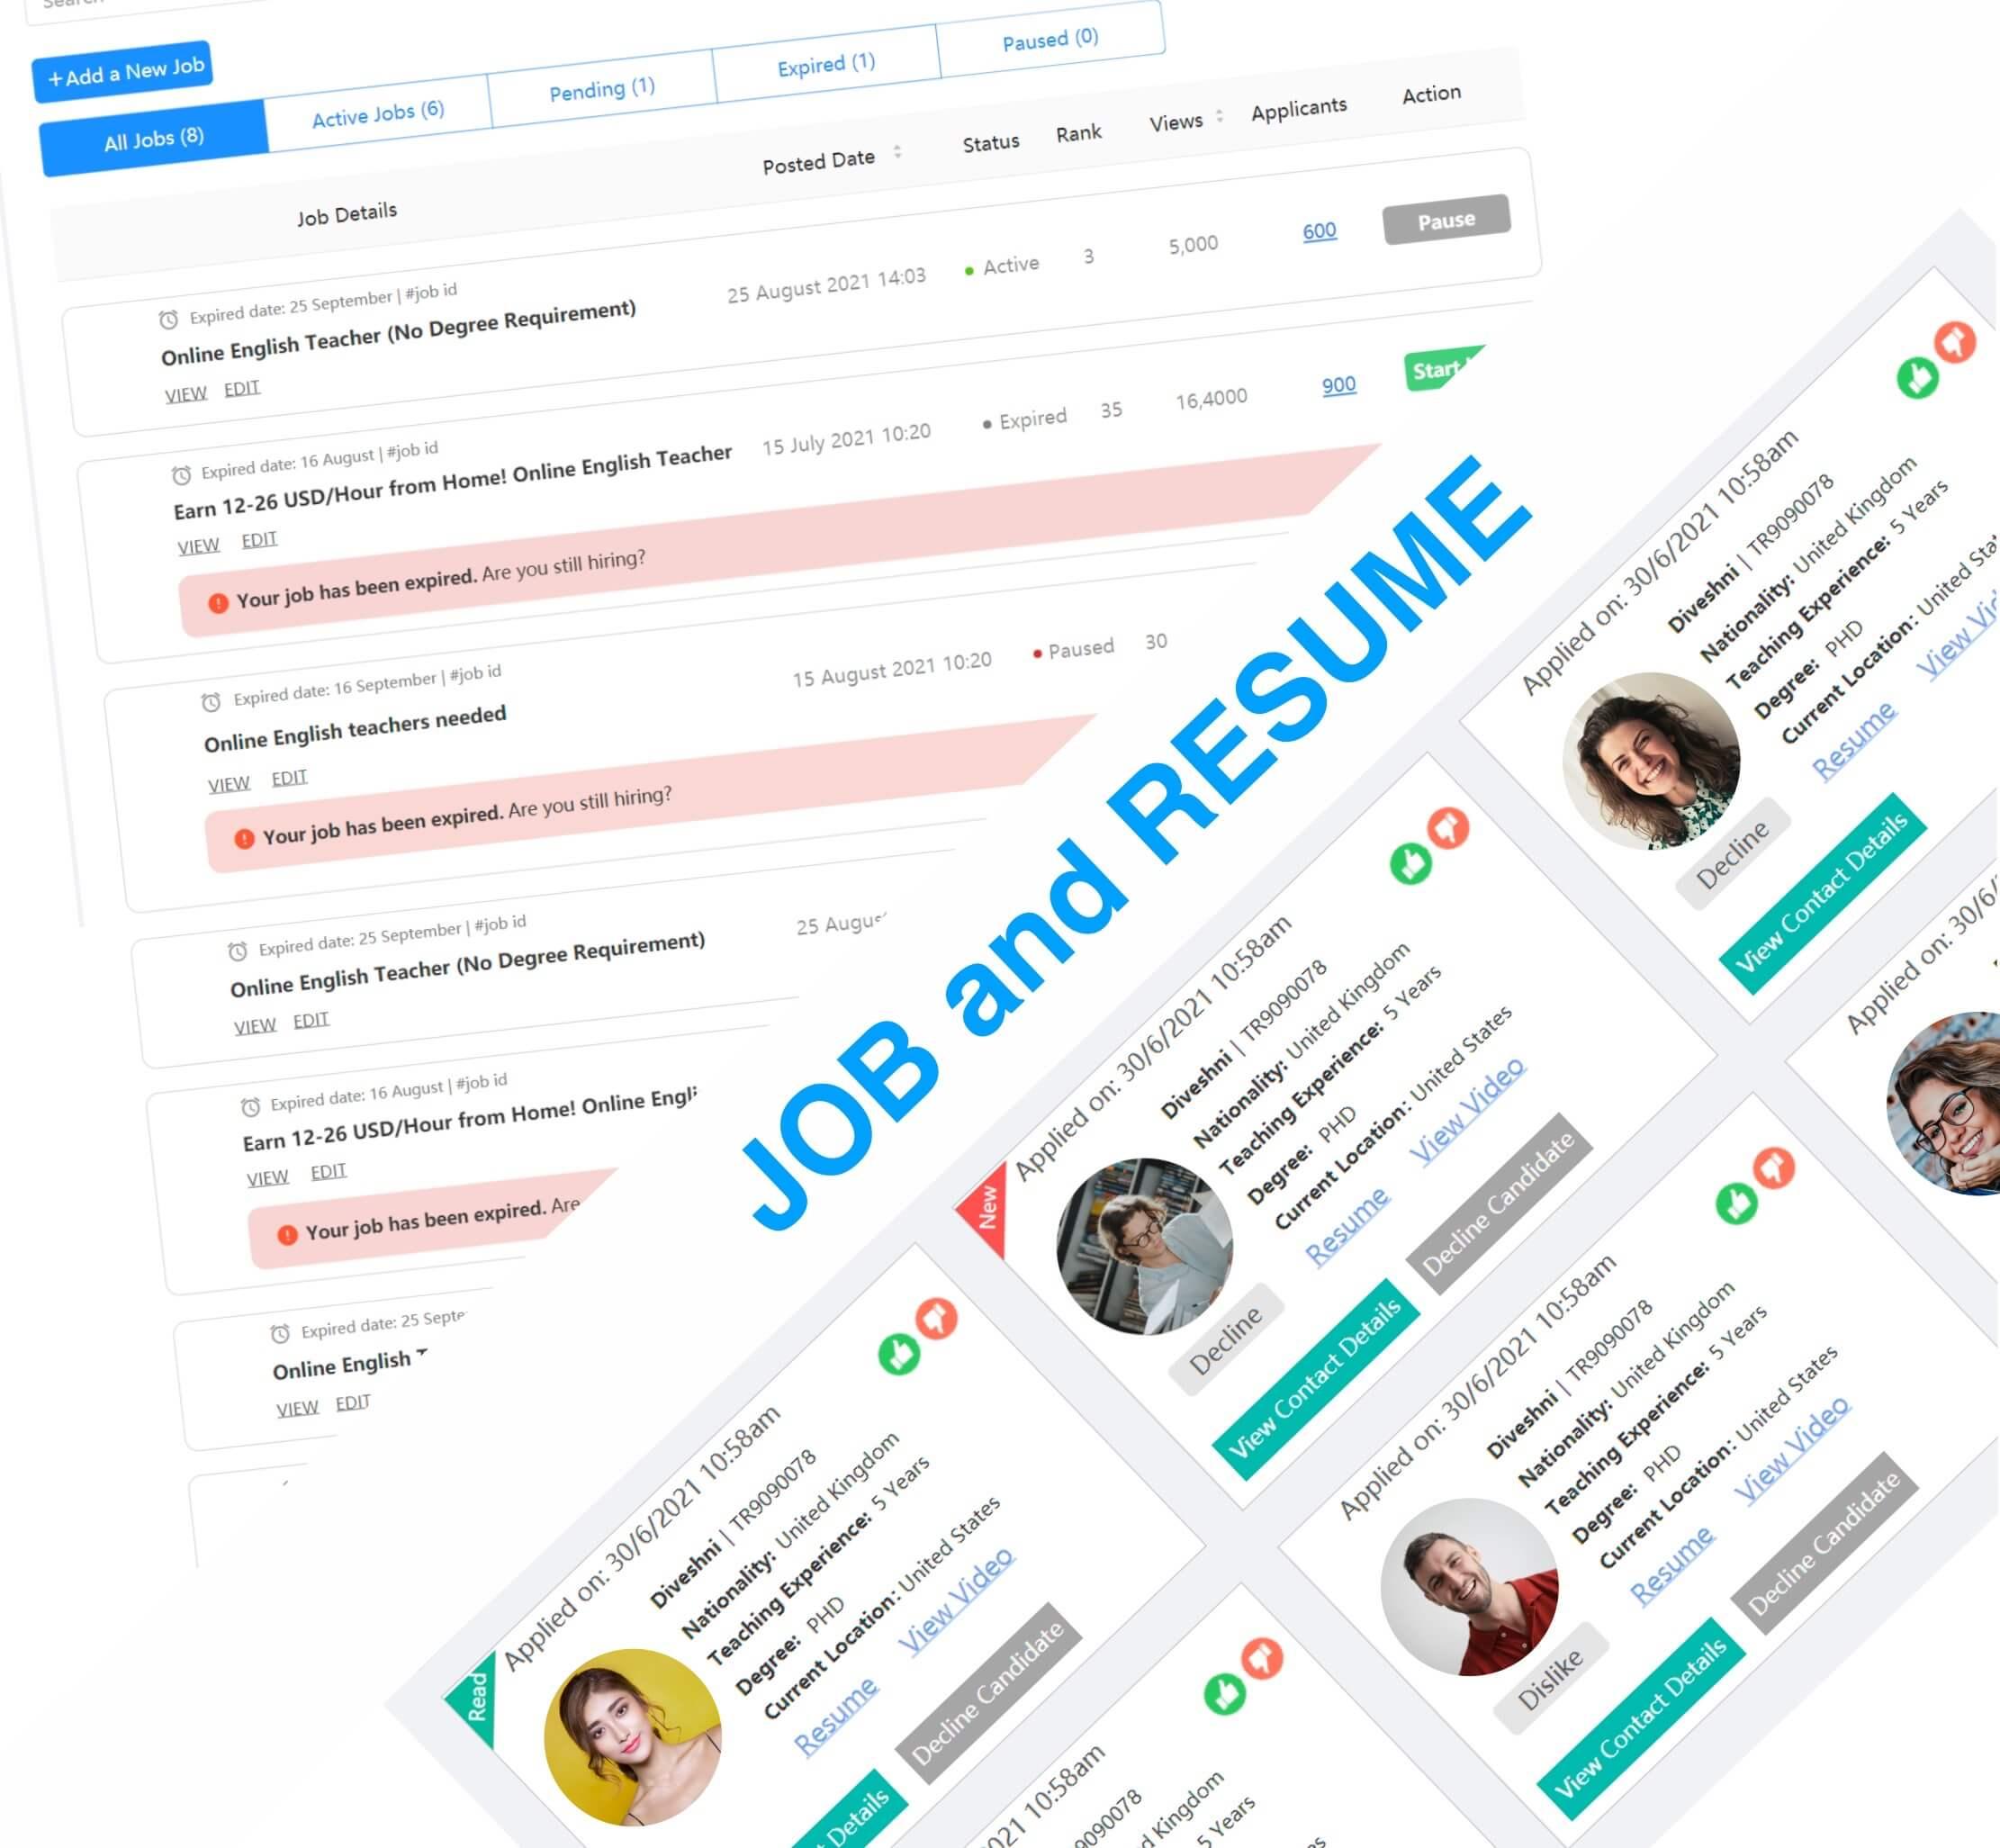 JOB and RESUME - TeacherRecord